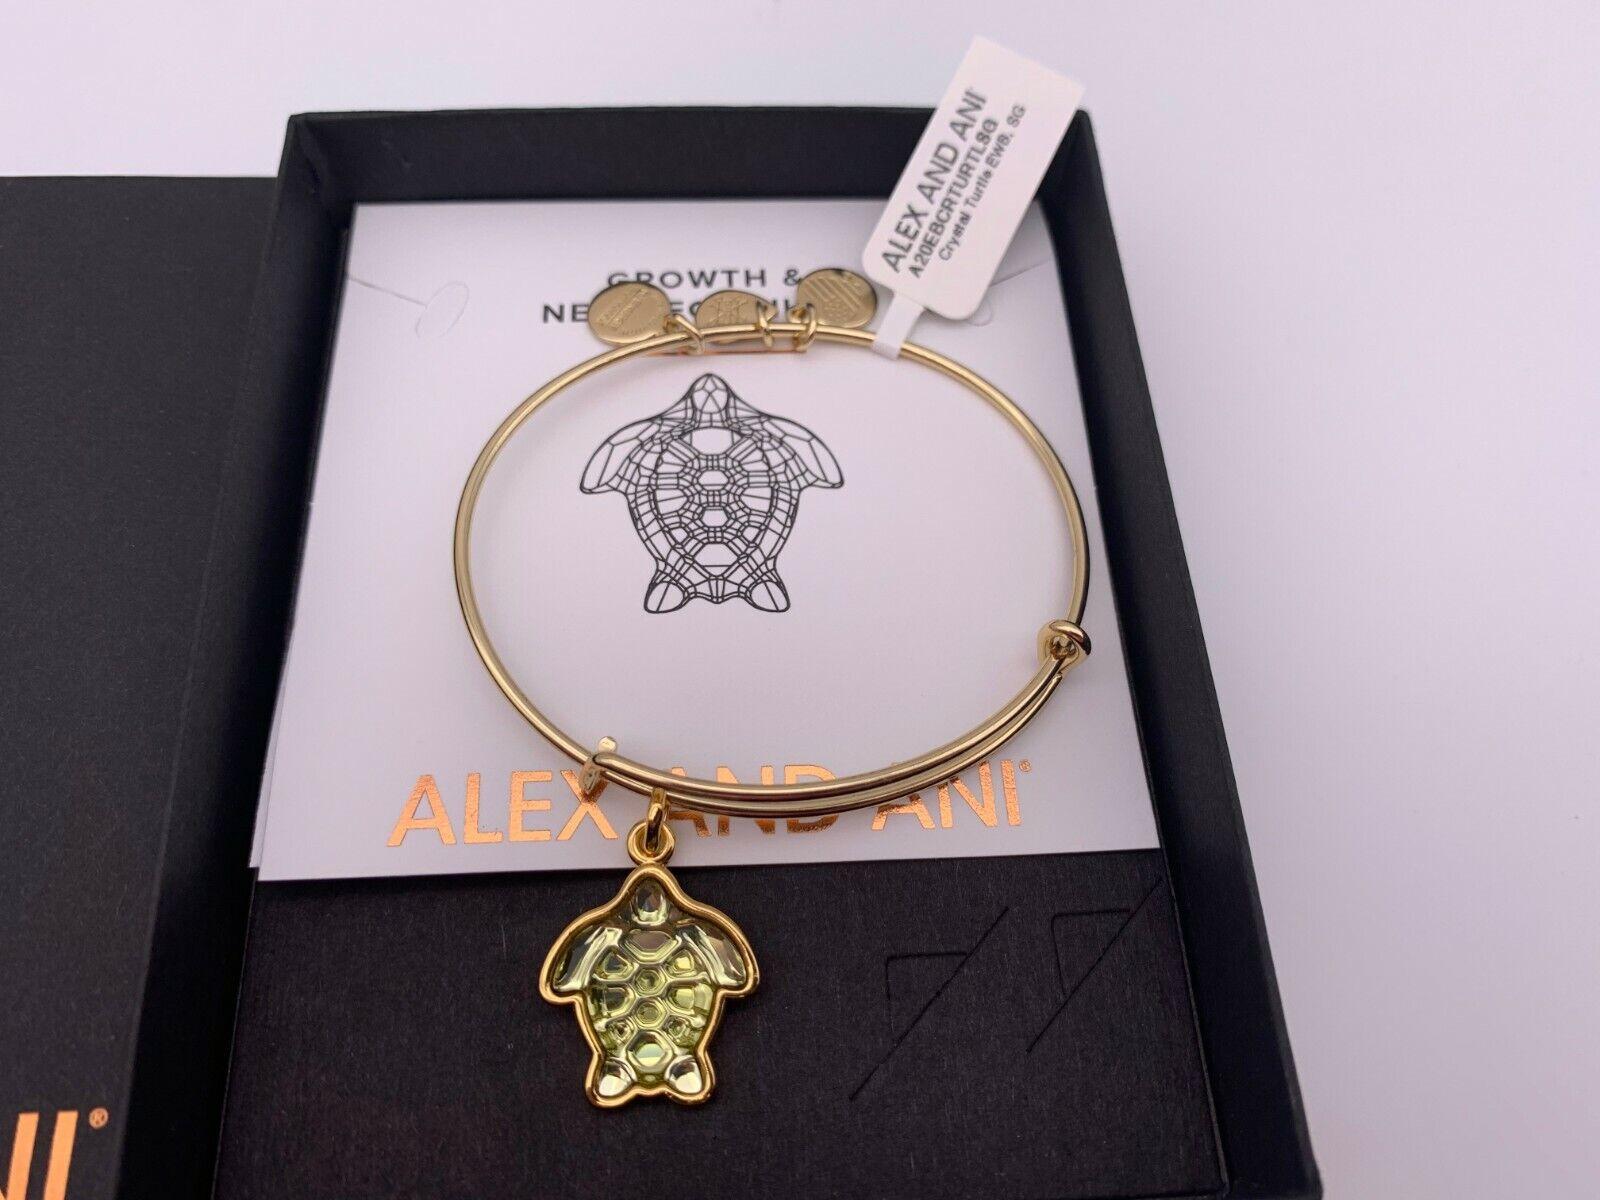 NEW Alex and Ani CRYSTAL TURTLE Shiny Gold Charm Bangle Brac